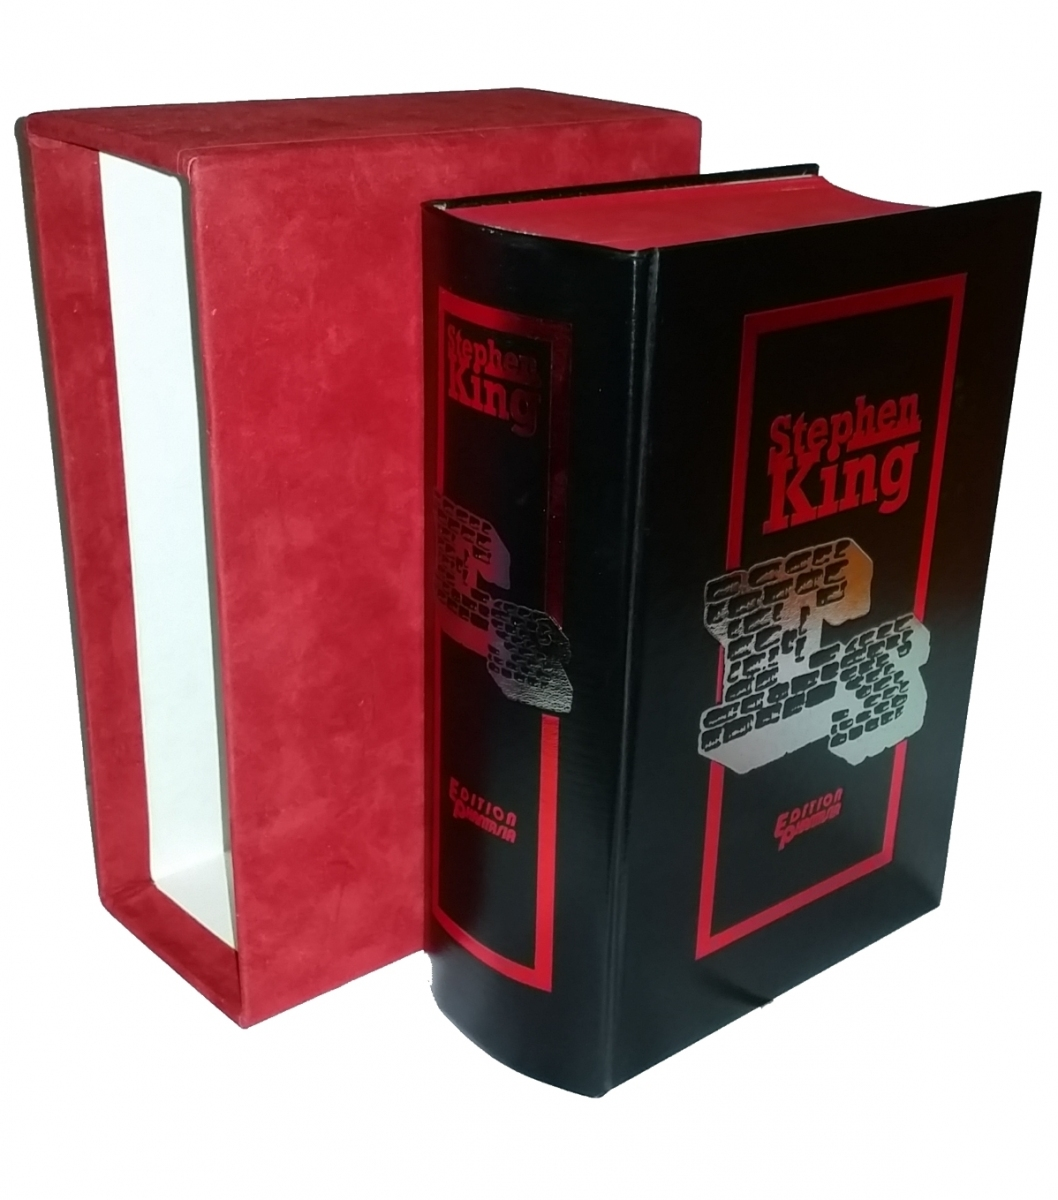 ES (Edition Phantasia) książka i etui - obrazek